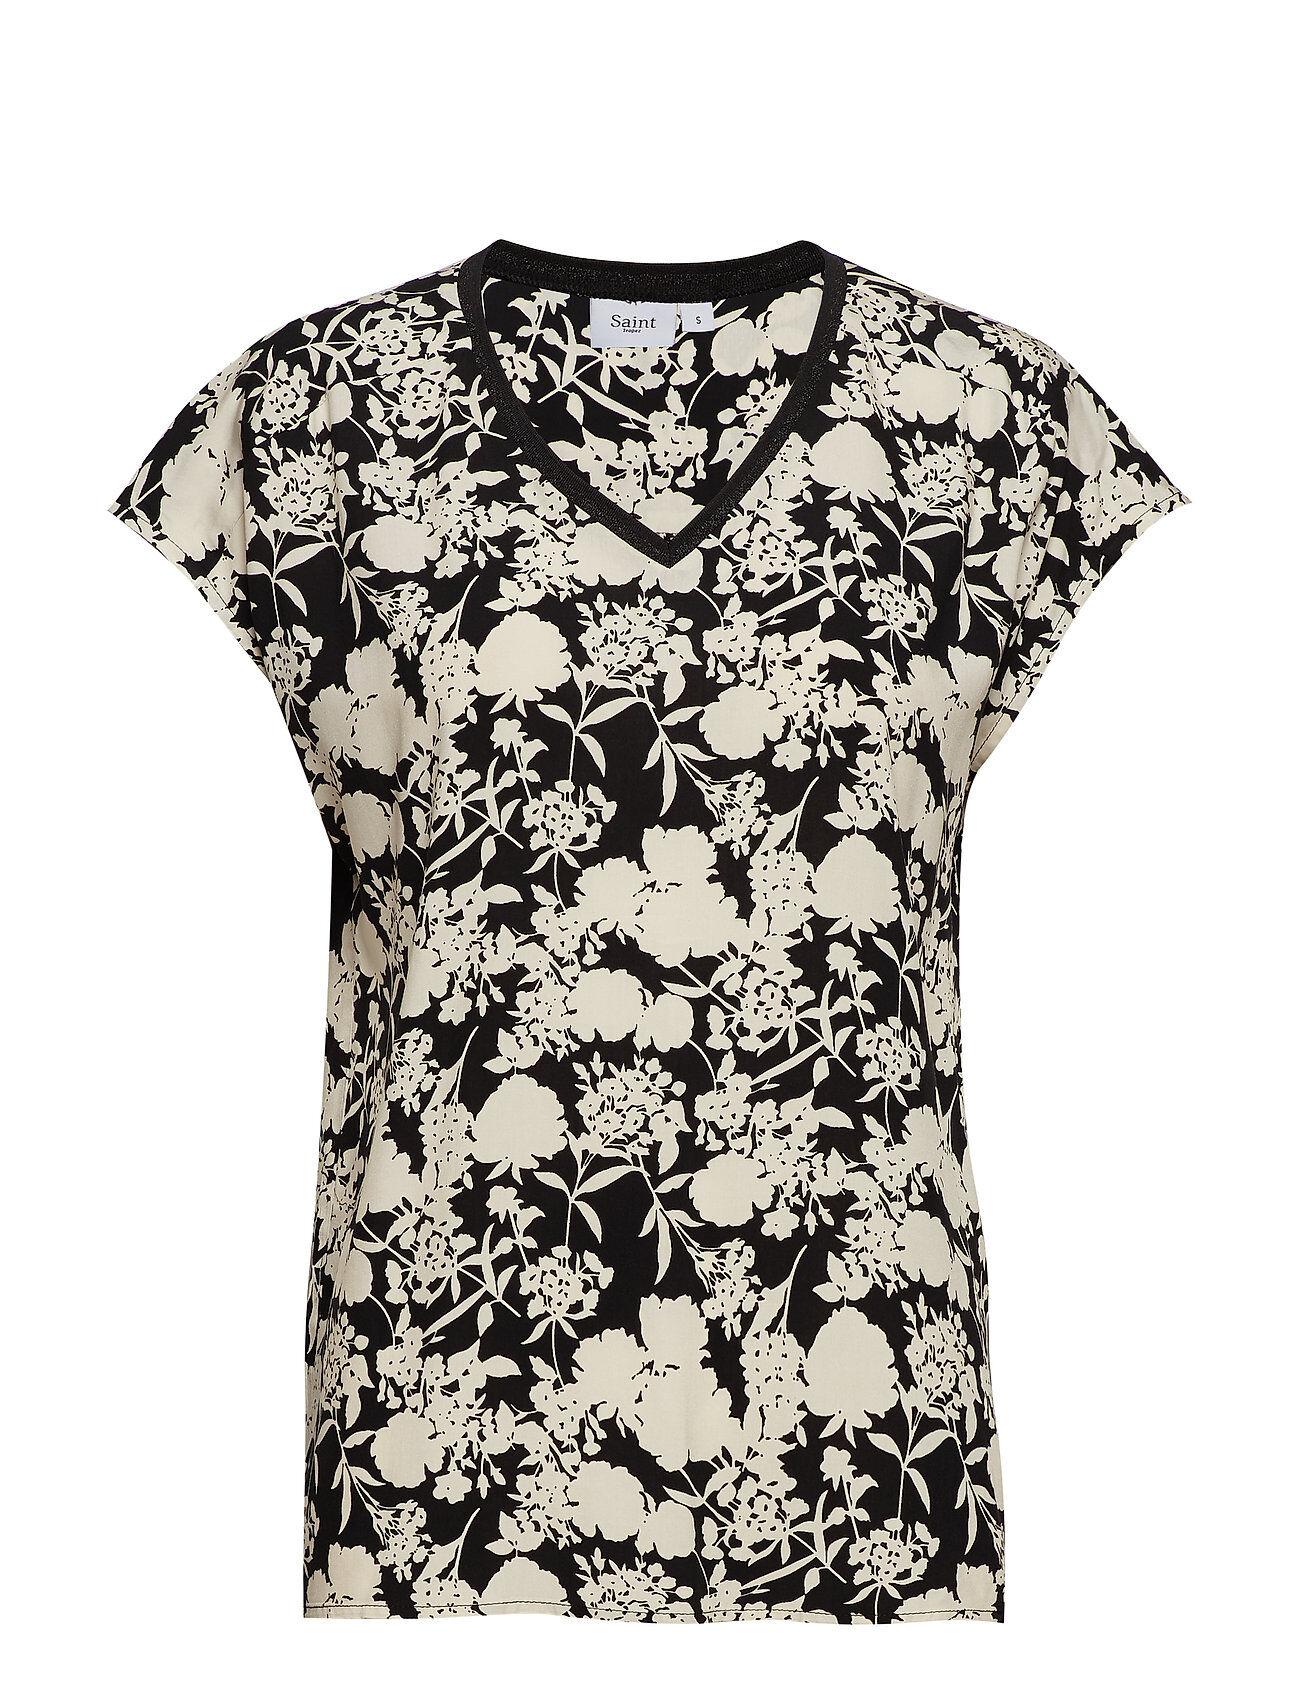 Saint Tropez Woven Top S/S W. Rib T-shirts & Tops Short-sleeved Monivärinen/Kuvioitu Saint Tropez